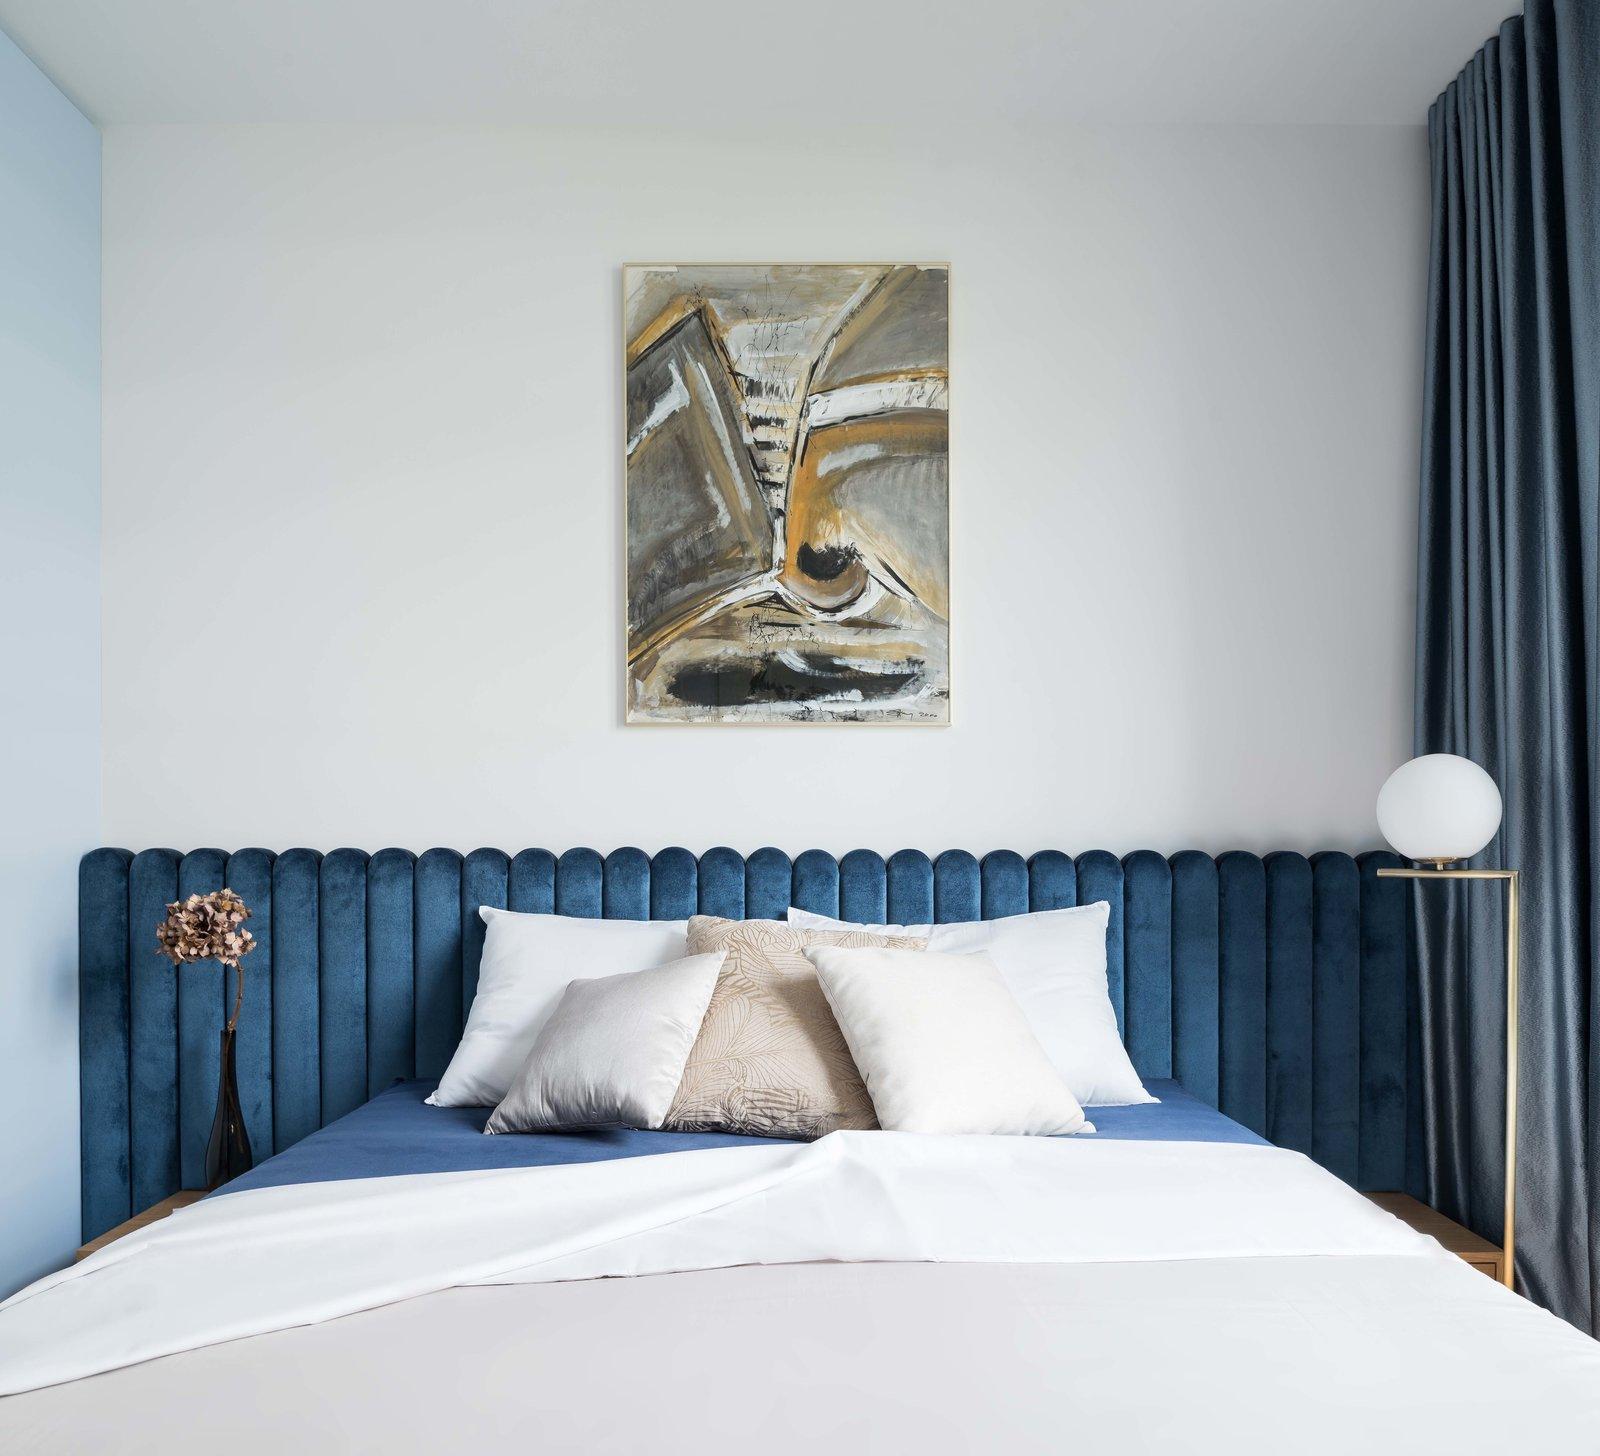 Bedroom, Night Stands, Floor Lighting, and Bed Bedroom with a velvet headboard  Lady by idealist studio